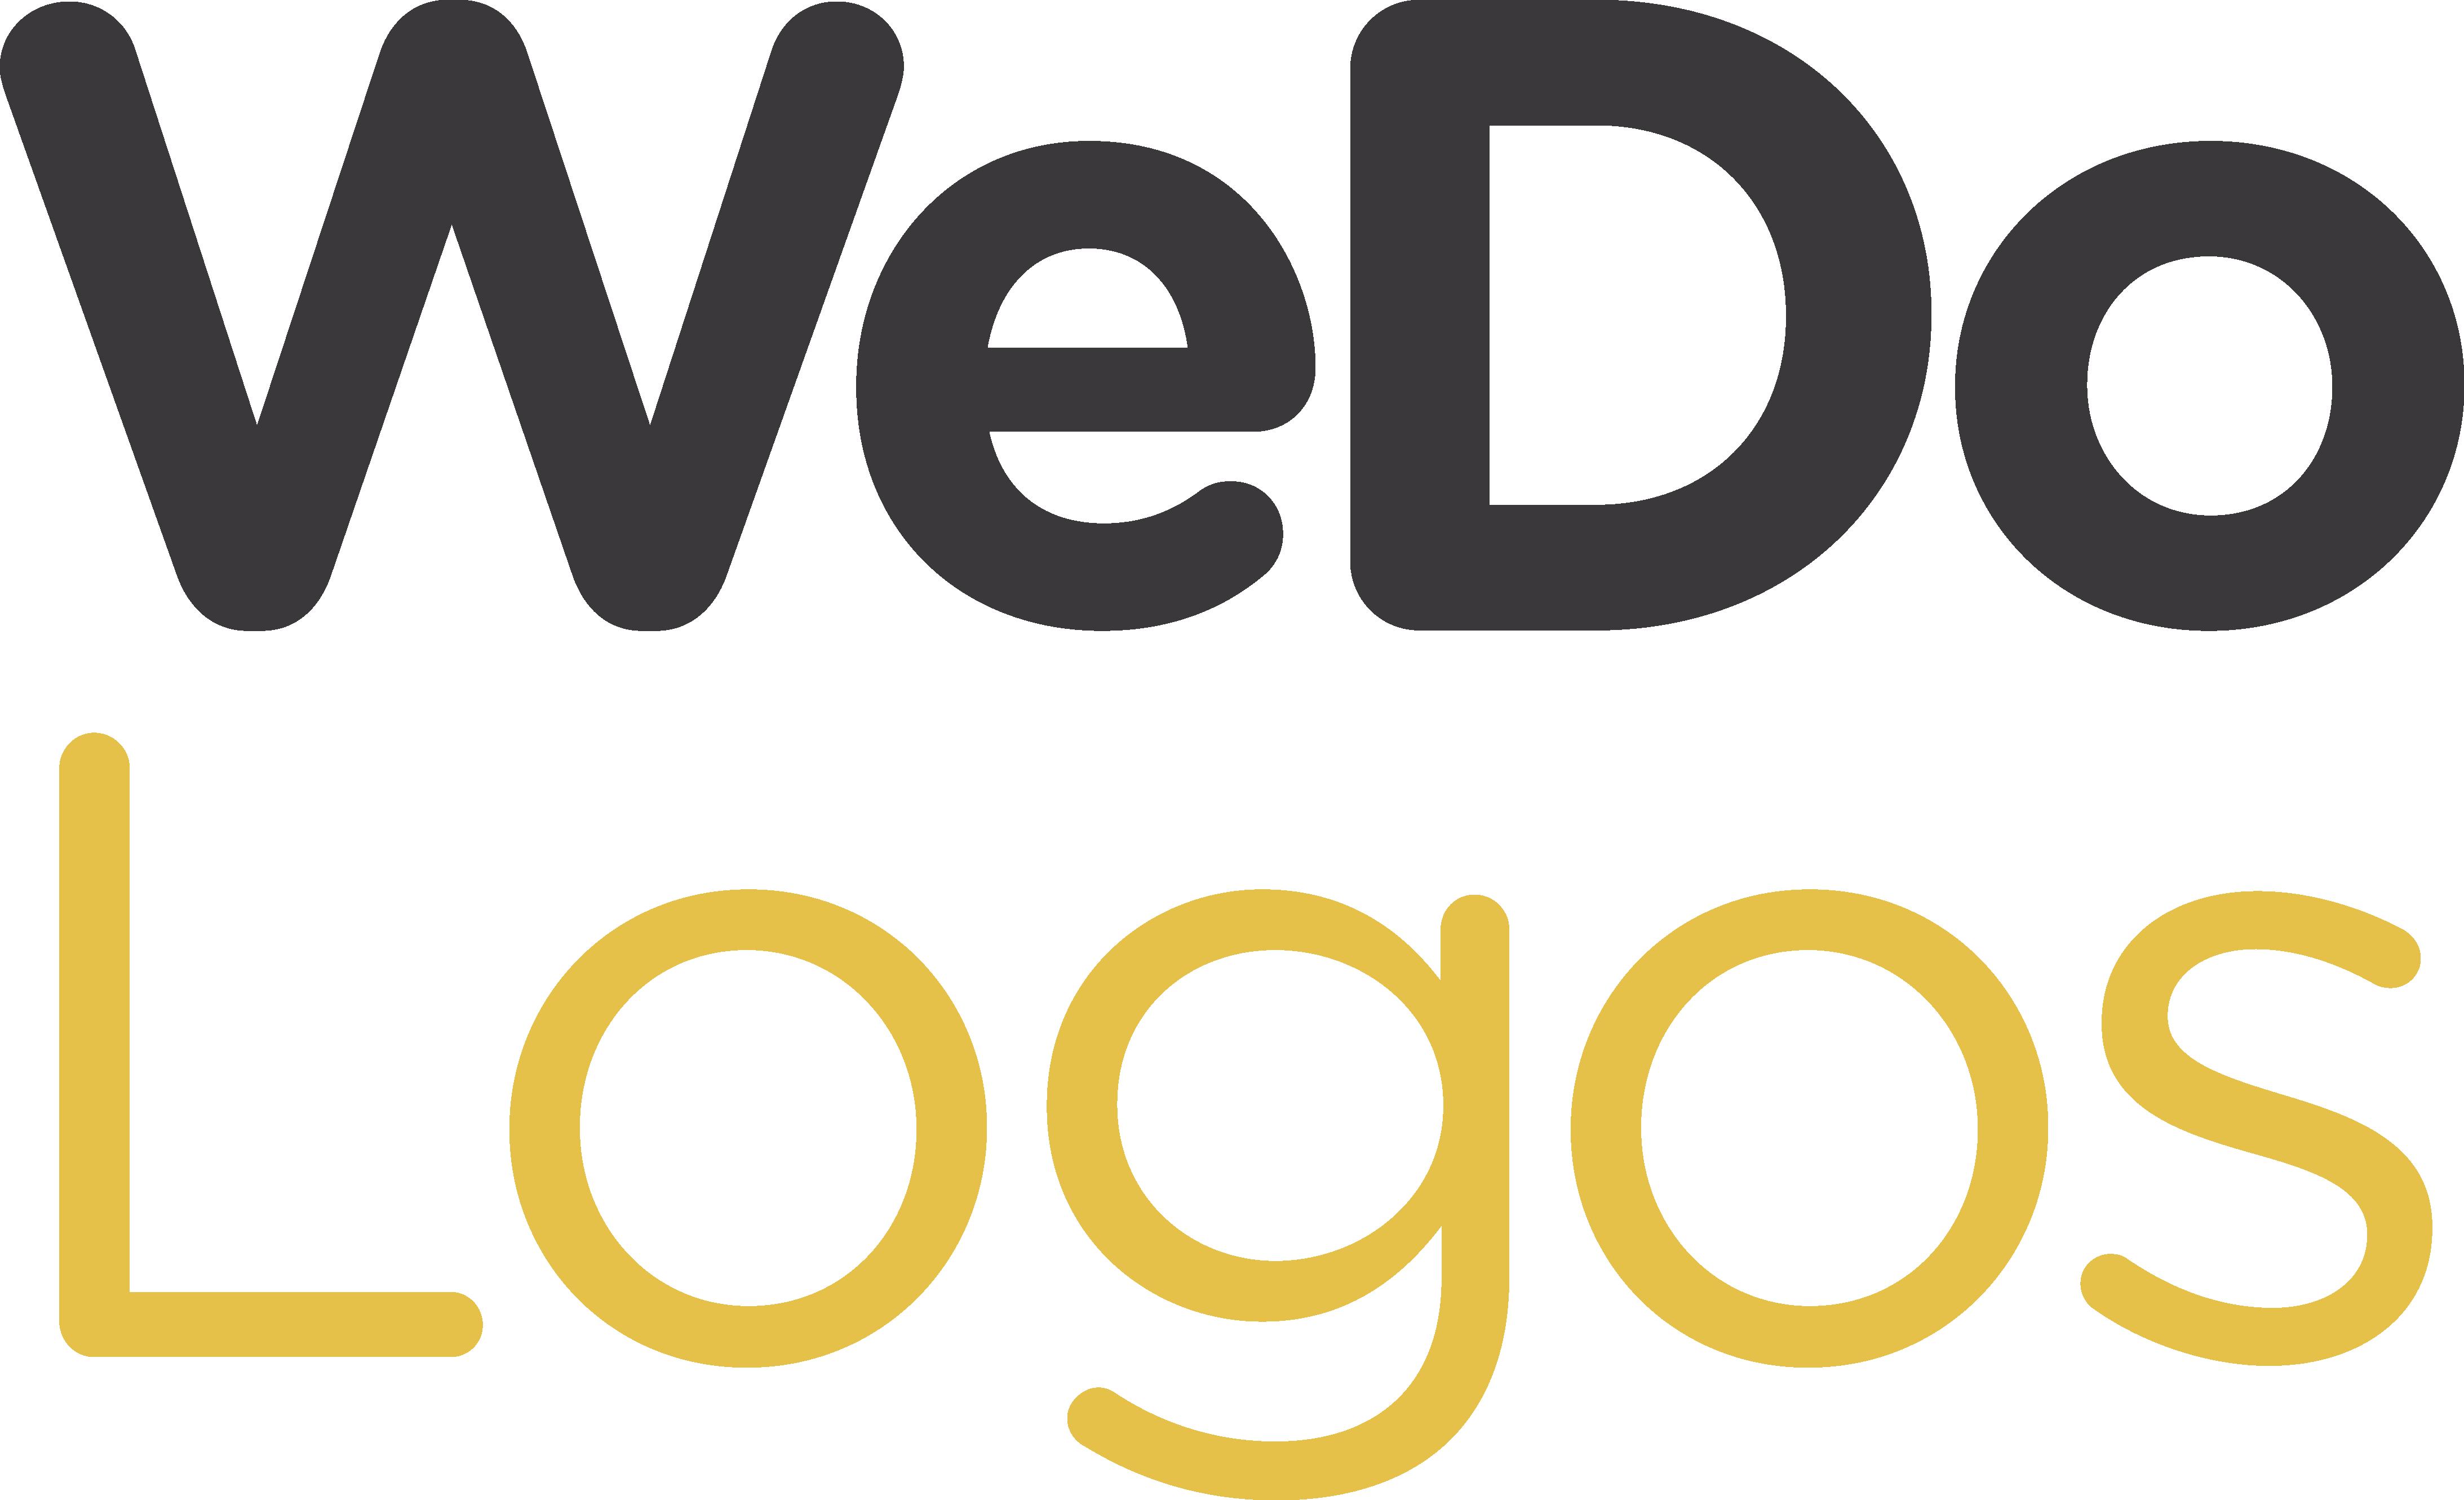 empreendedor wedologos 12 minutos